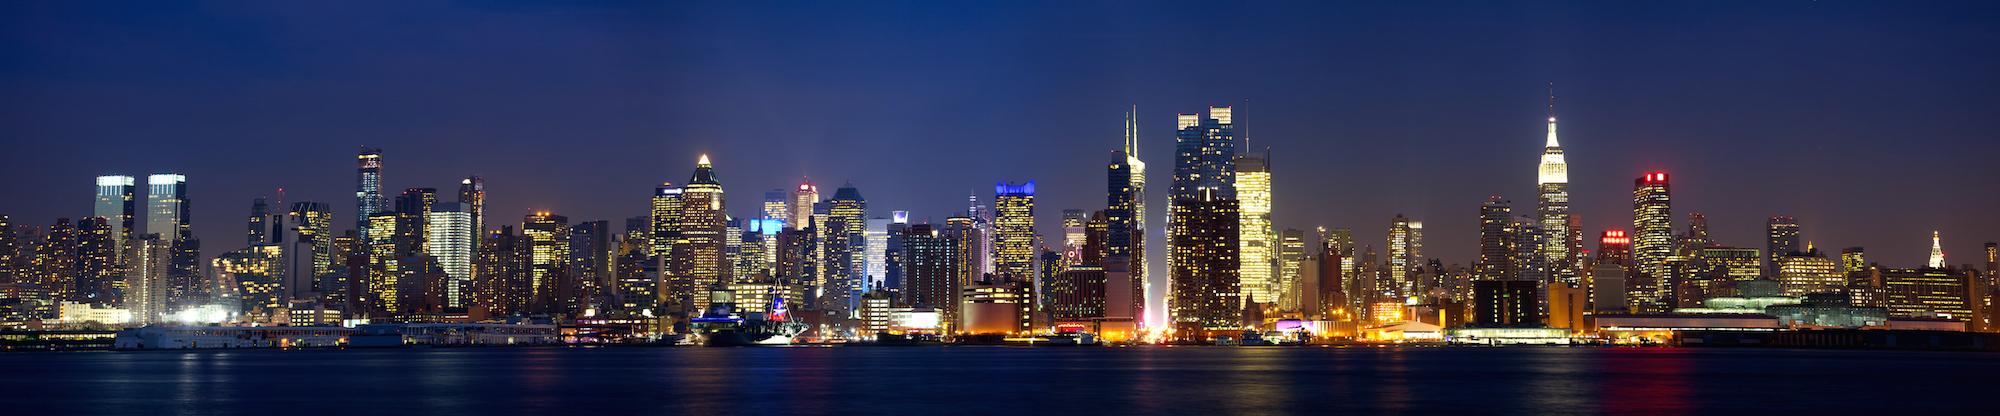 NHSMUN NYC